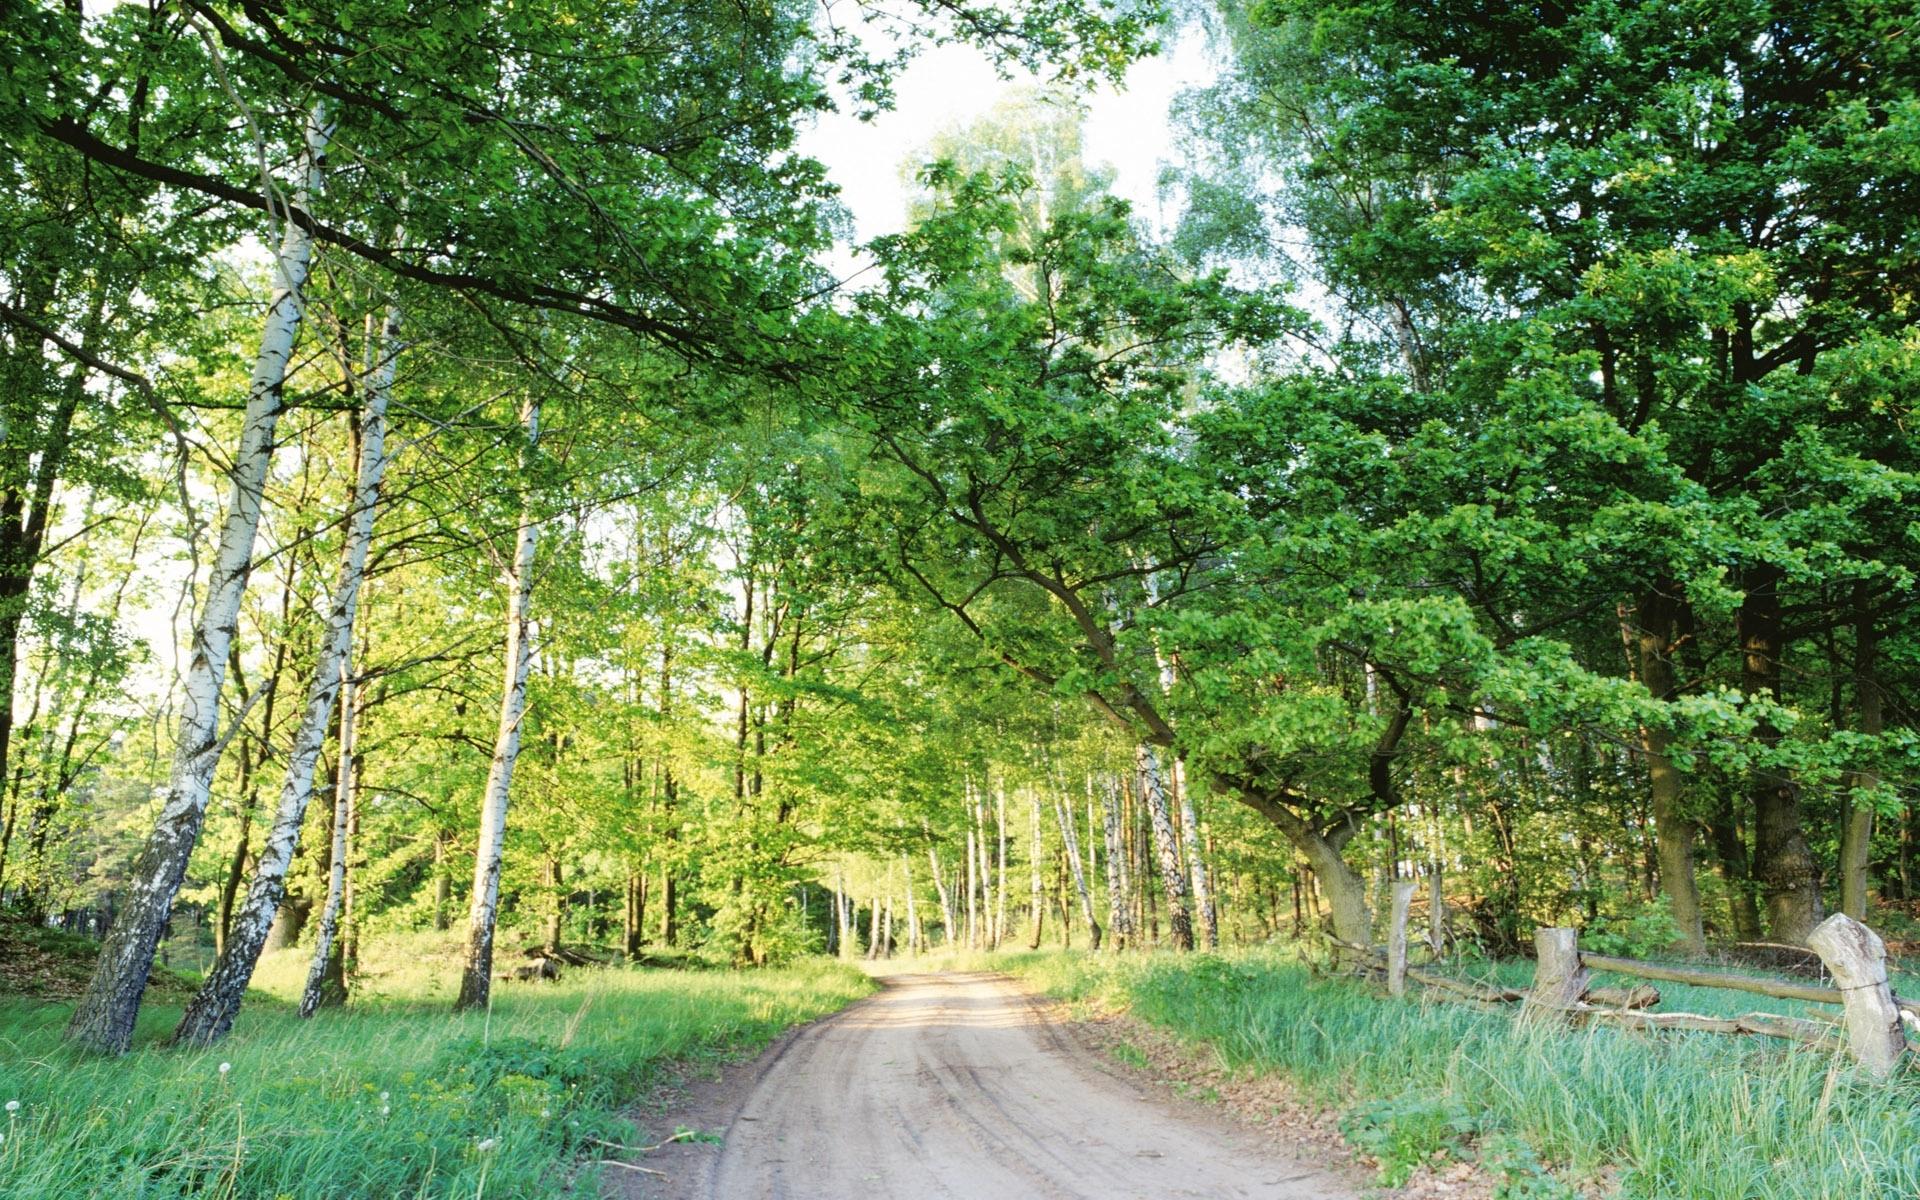 Handy-Wallpaper Pflanzen, Landschaft, Bäume, Roads kostenlos herunterladen.